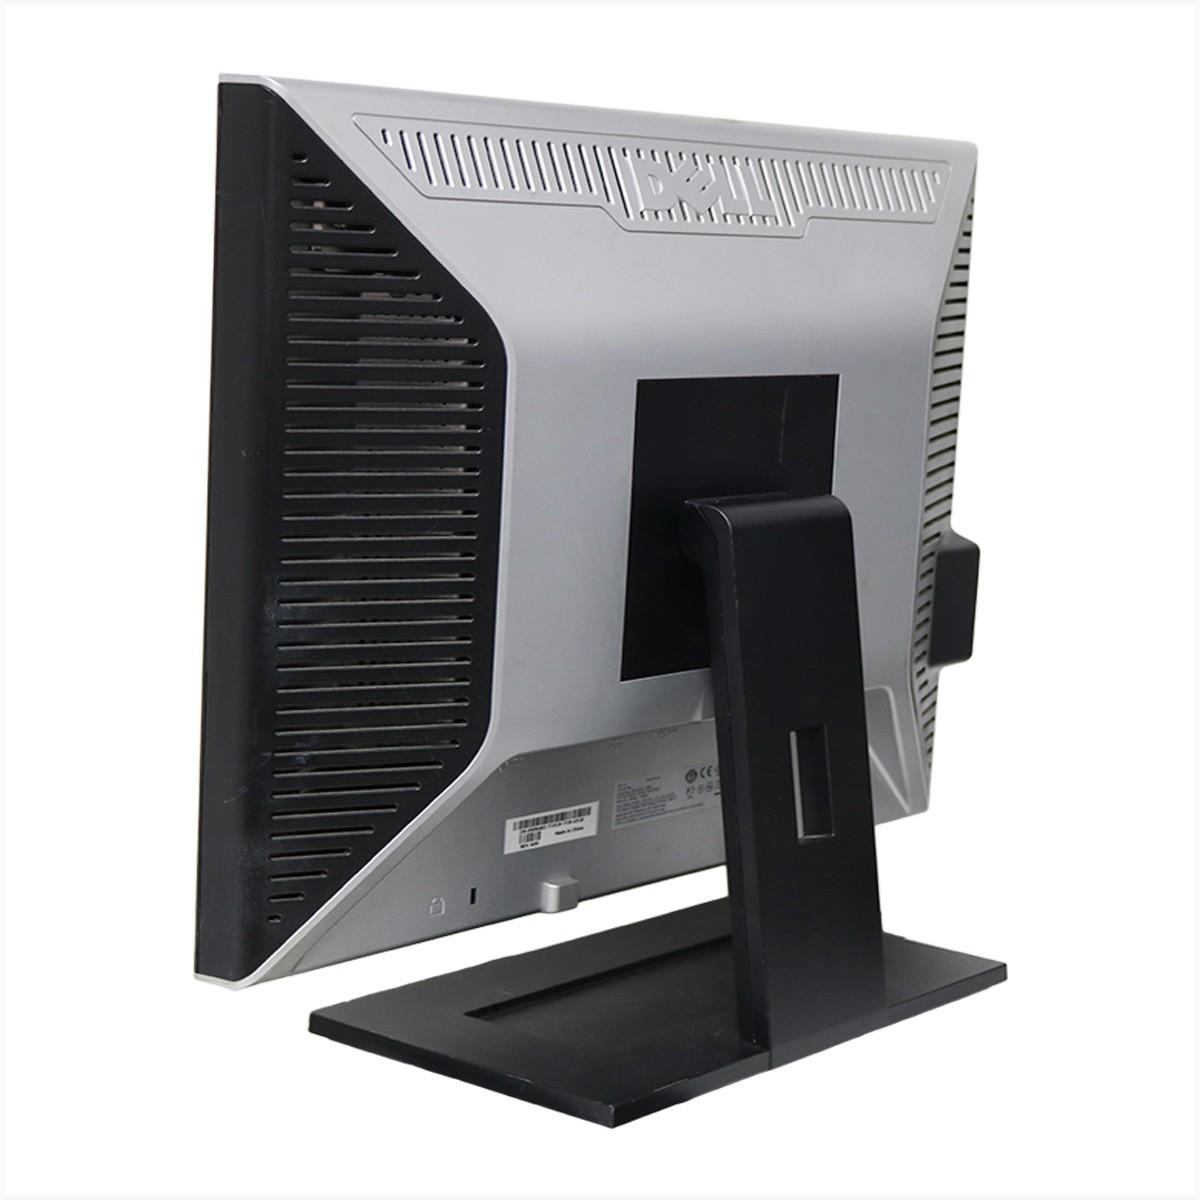 "Monitor Dell 1908fpt 19"" - Usado"